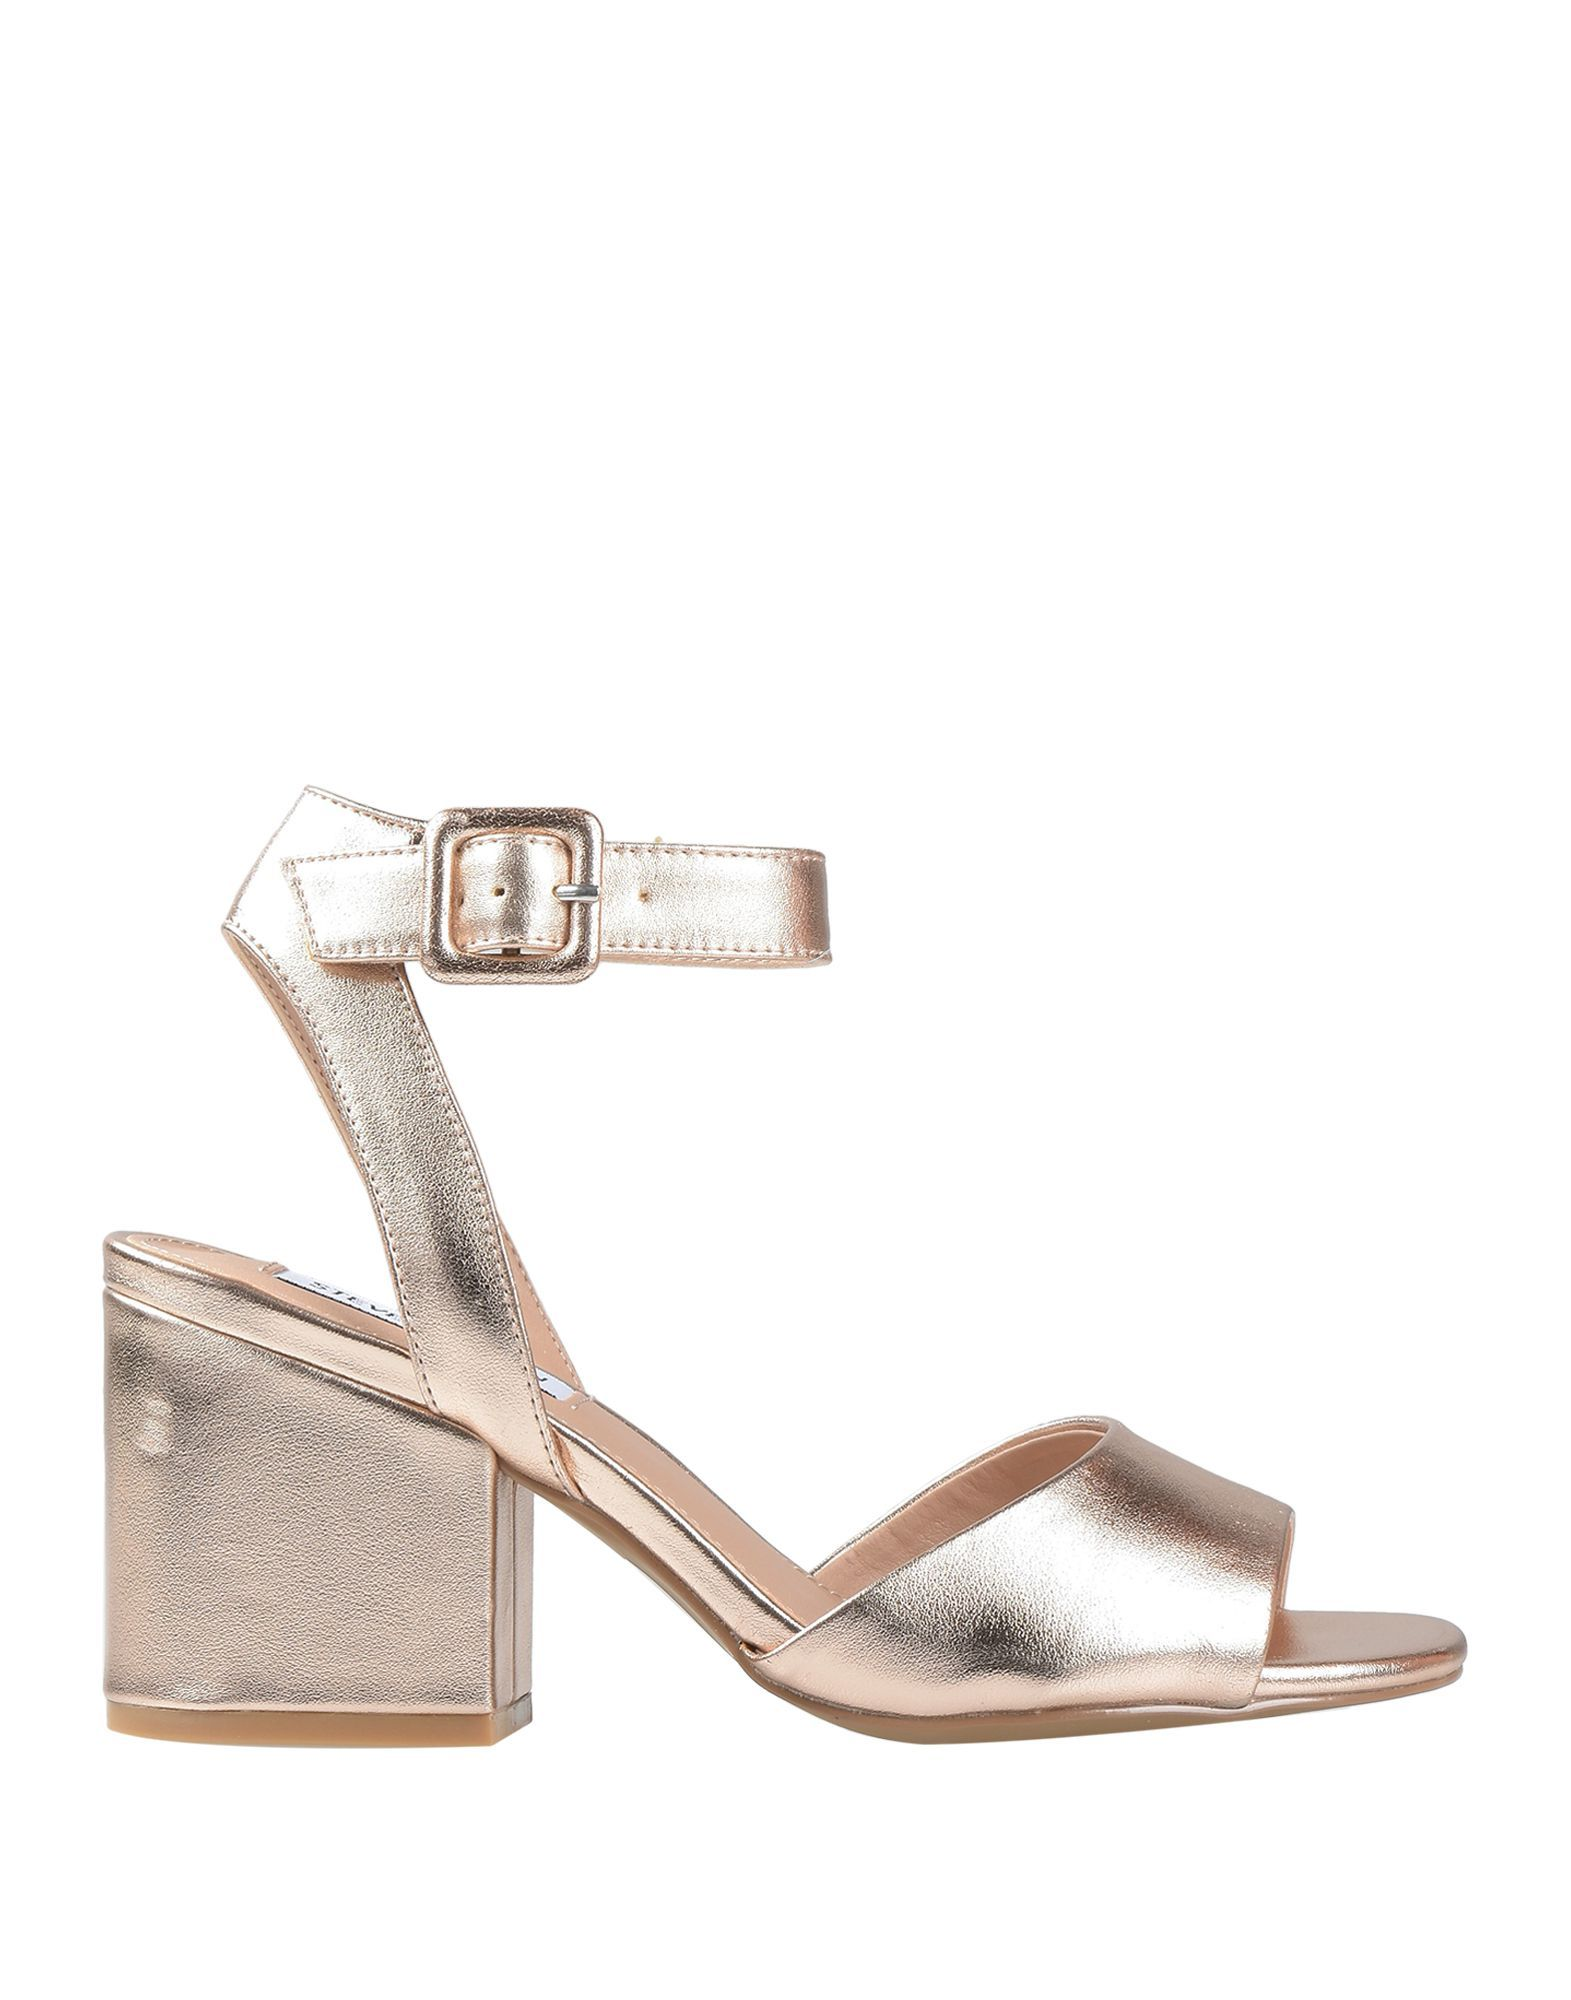 Steve Madden Copper Heeled Sandals